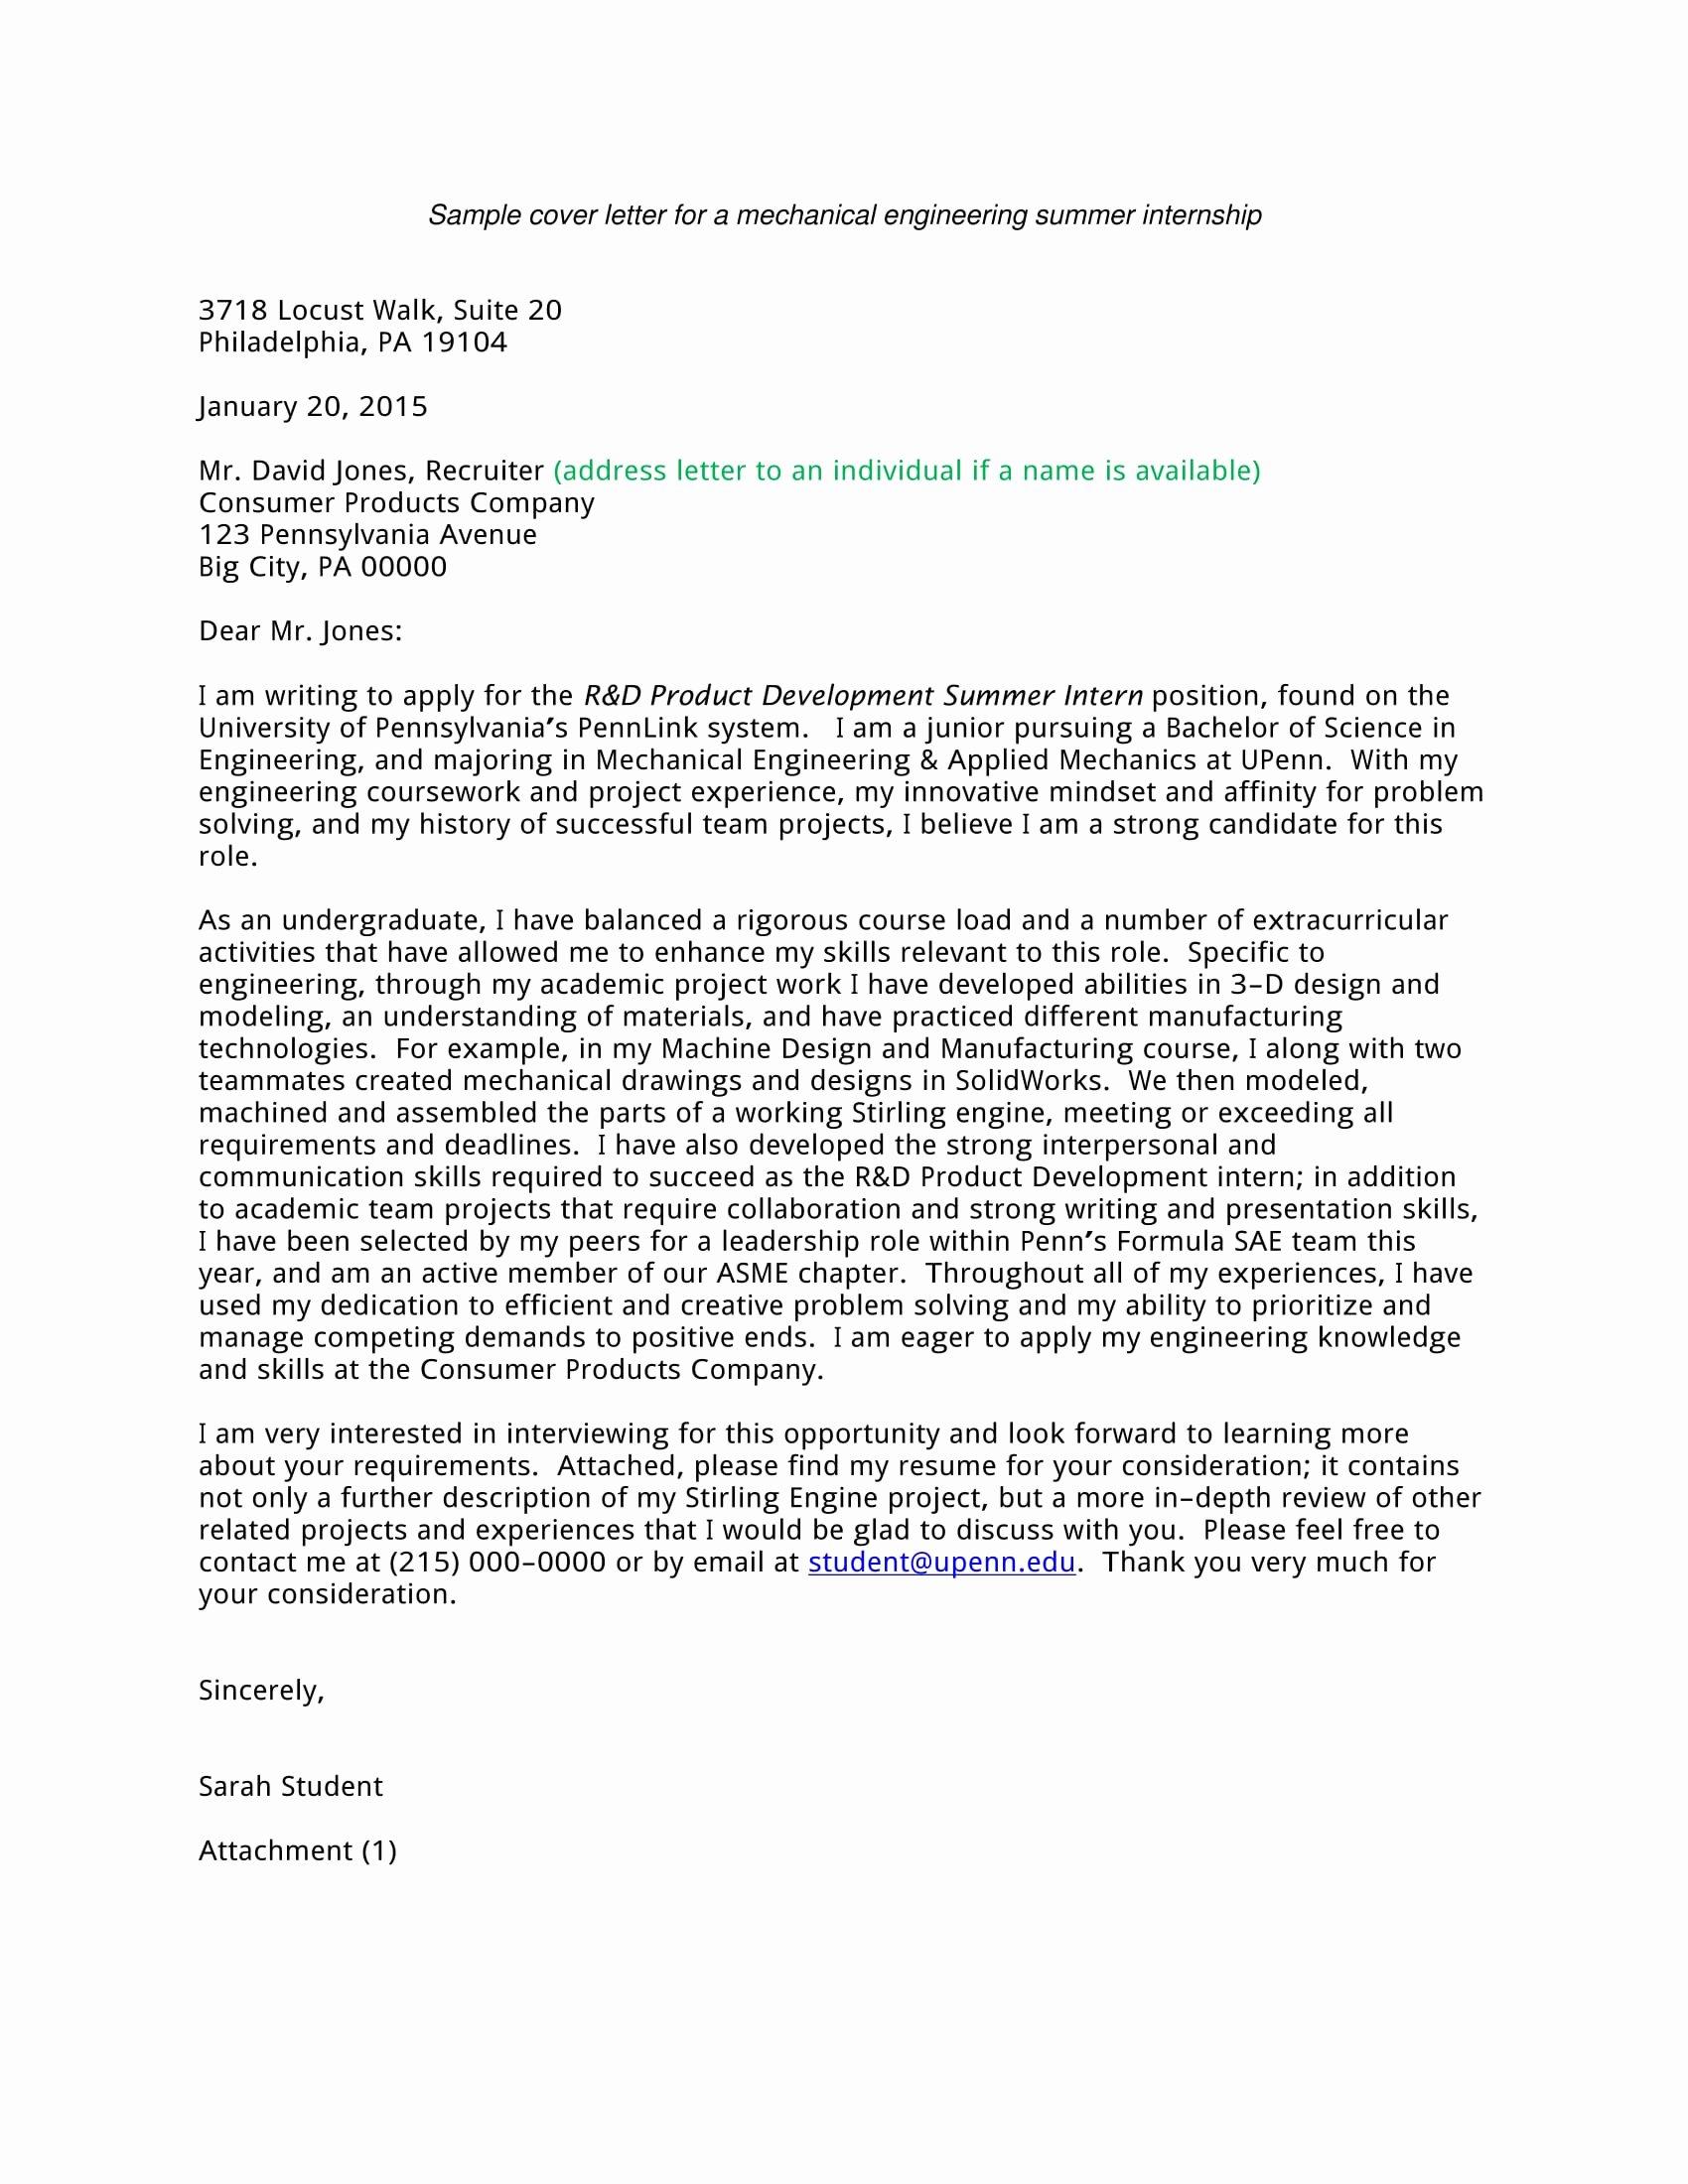 16 Best Cover Letter Samples for Internship Wisestep